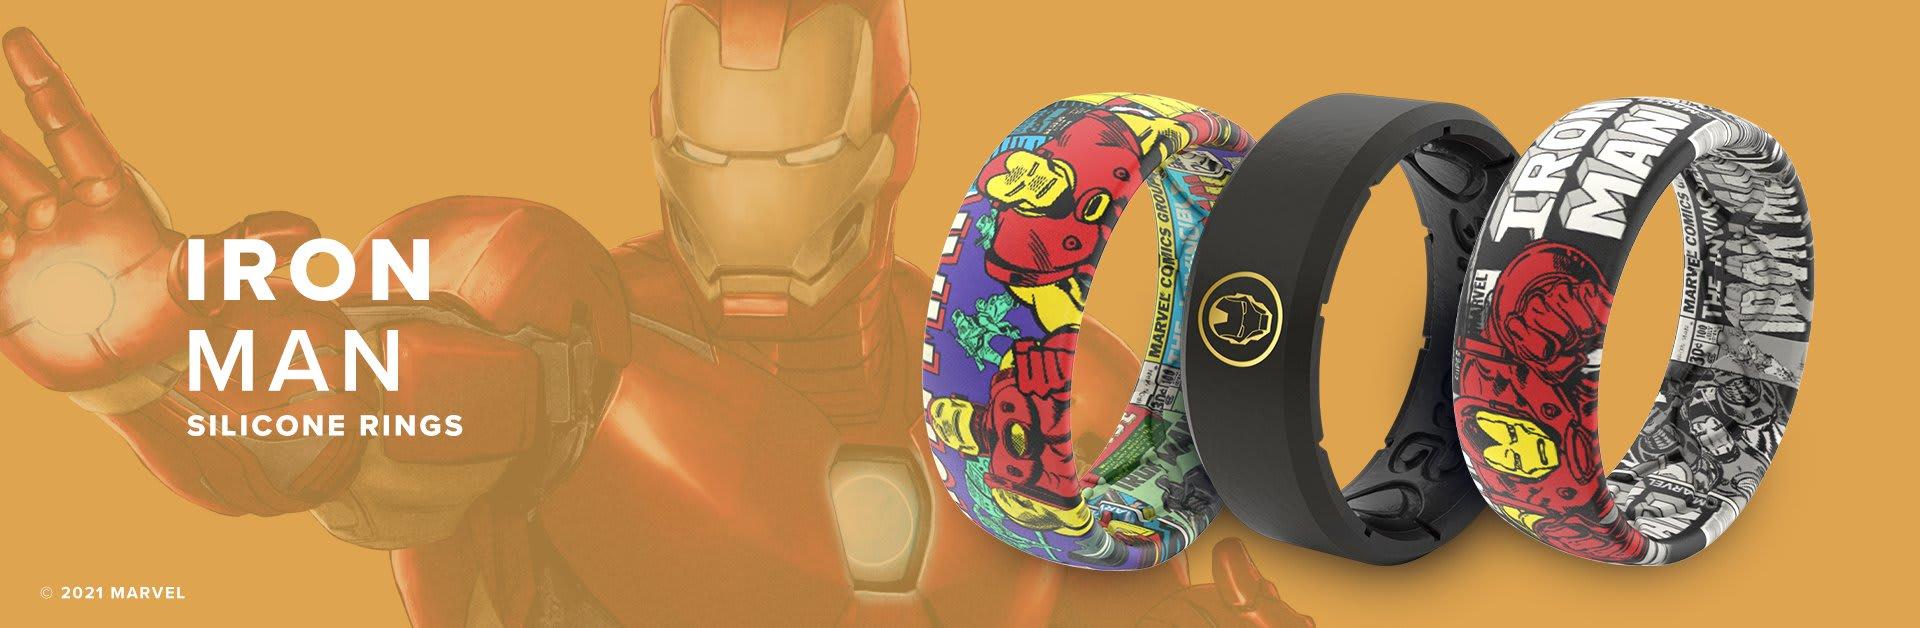 Iron Man Silicone Rings